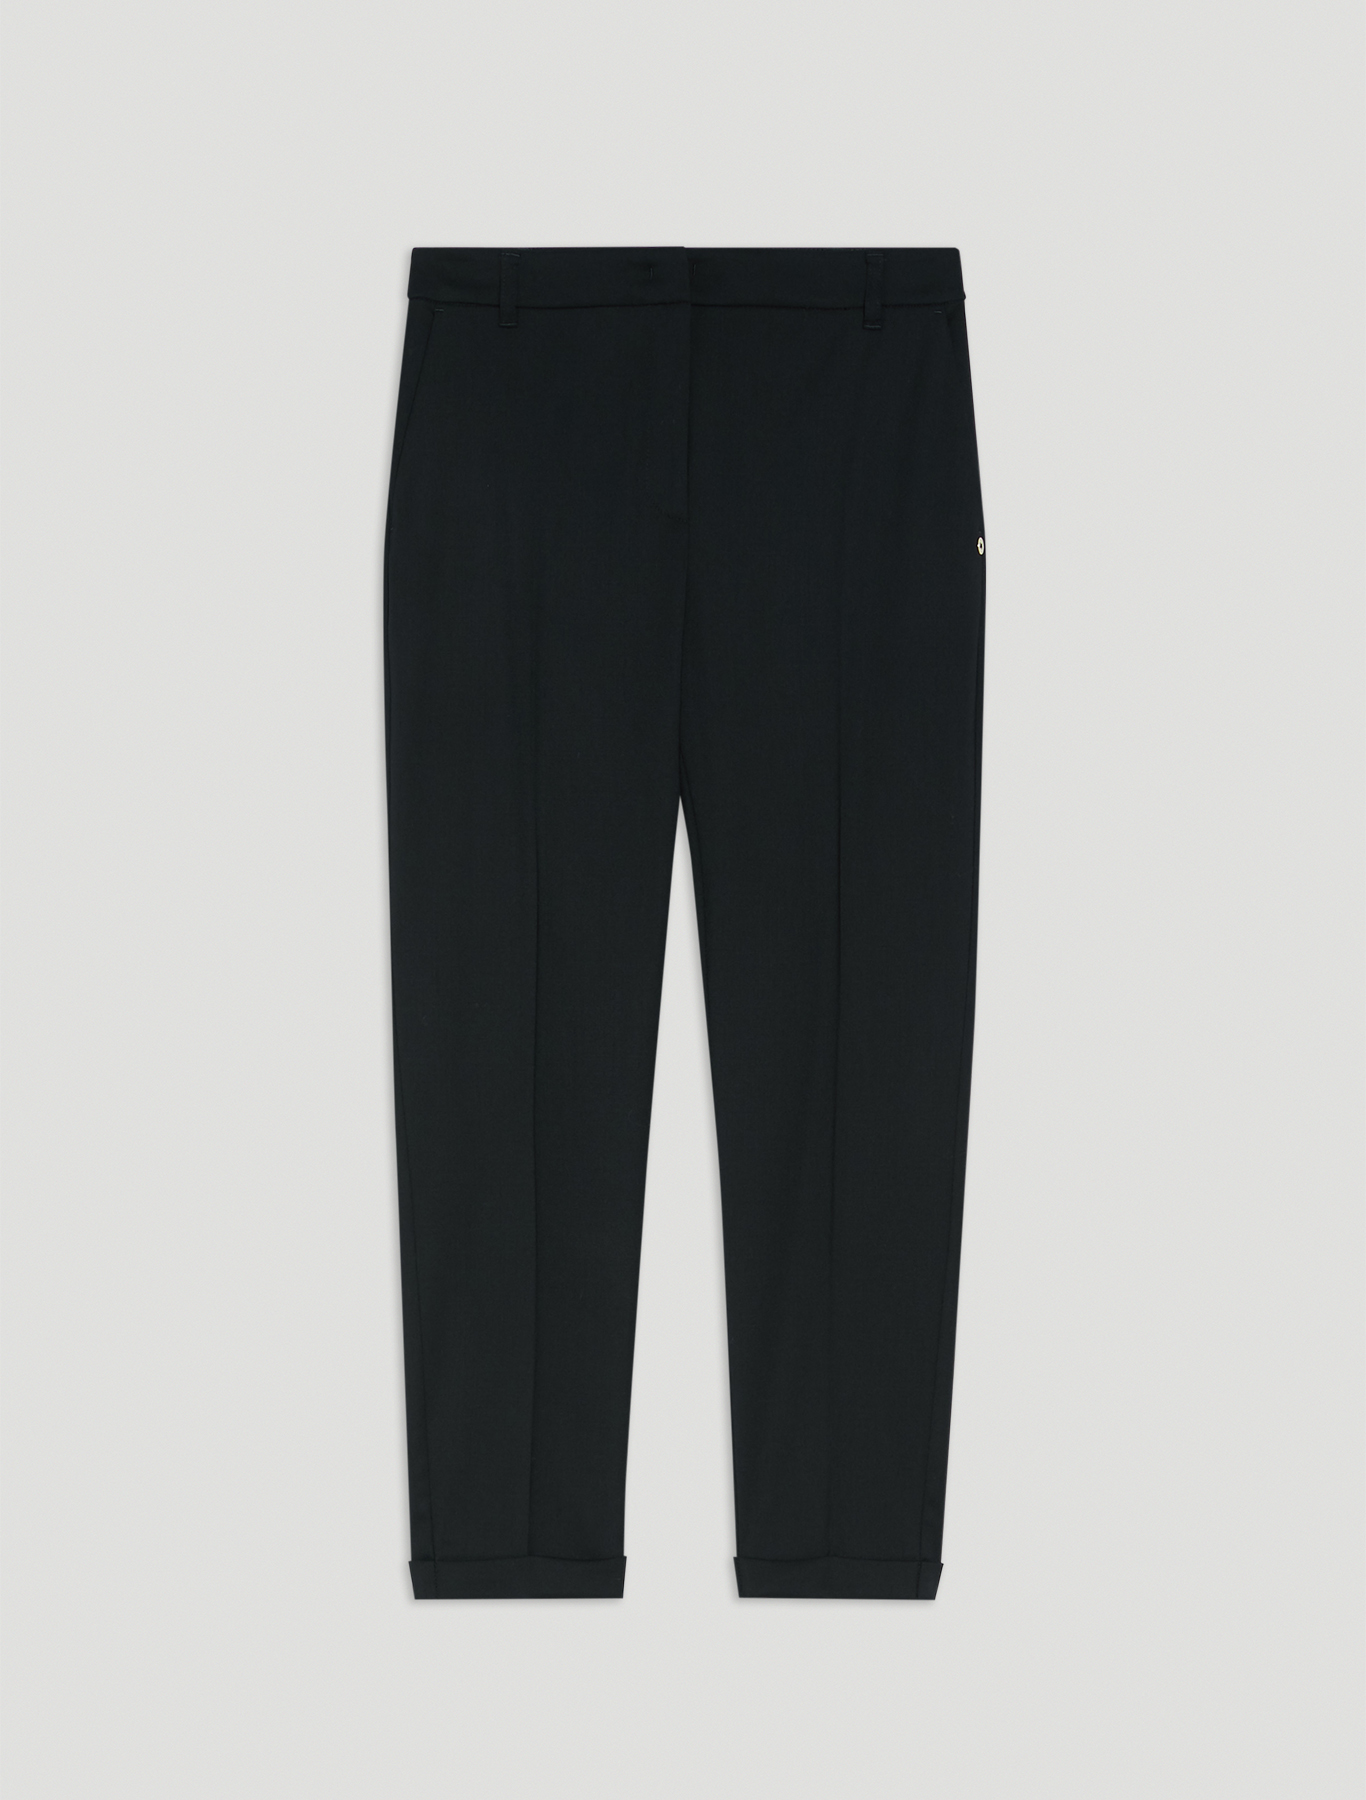 Stretch wool slim trousers - black - pennyblack